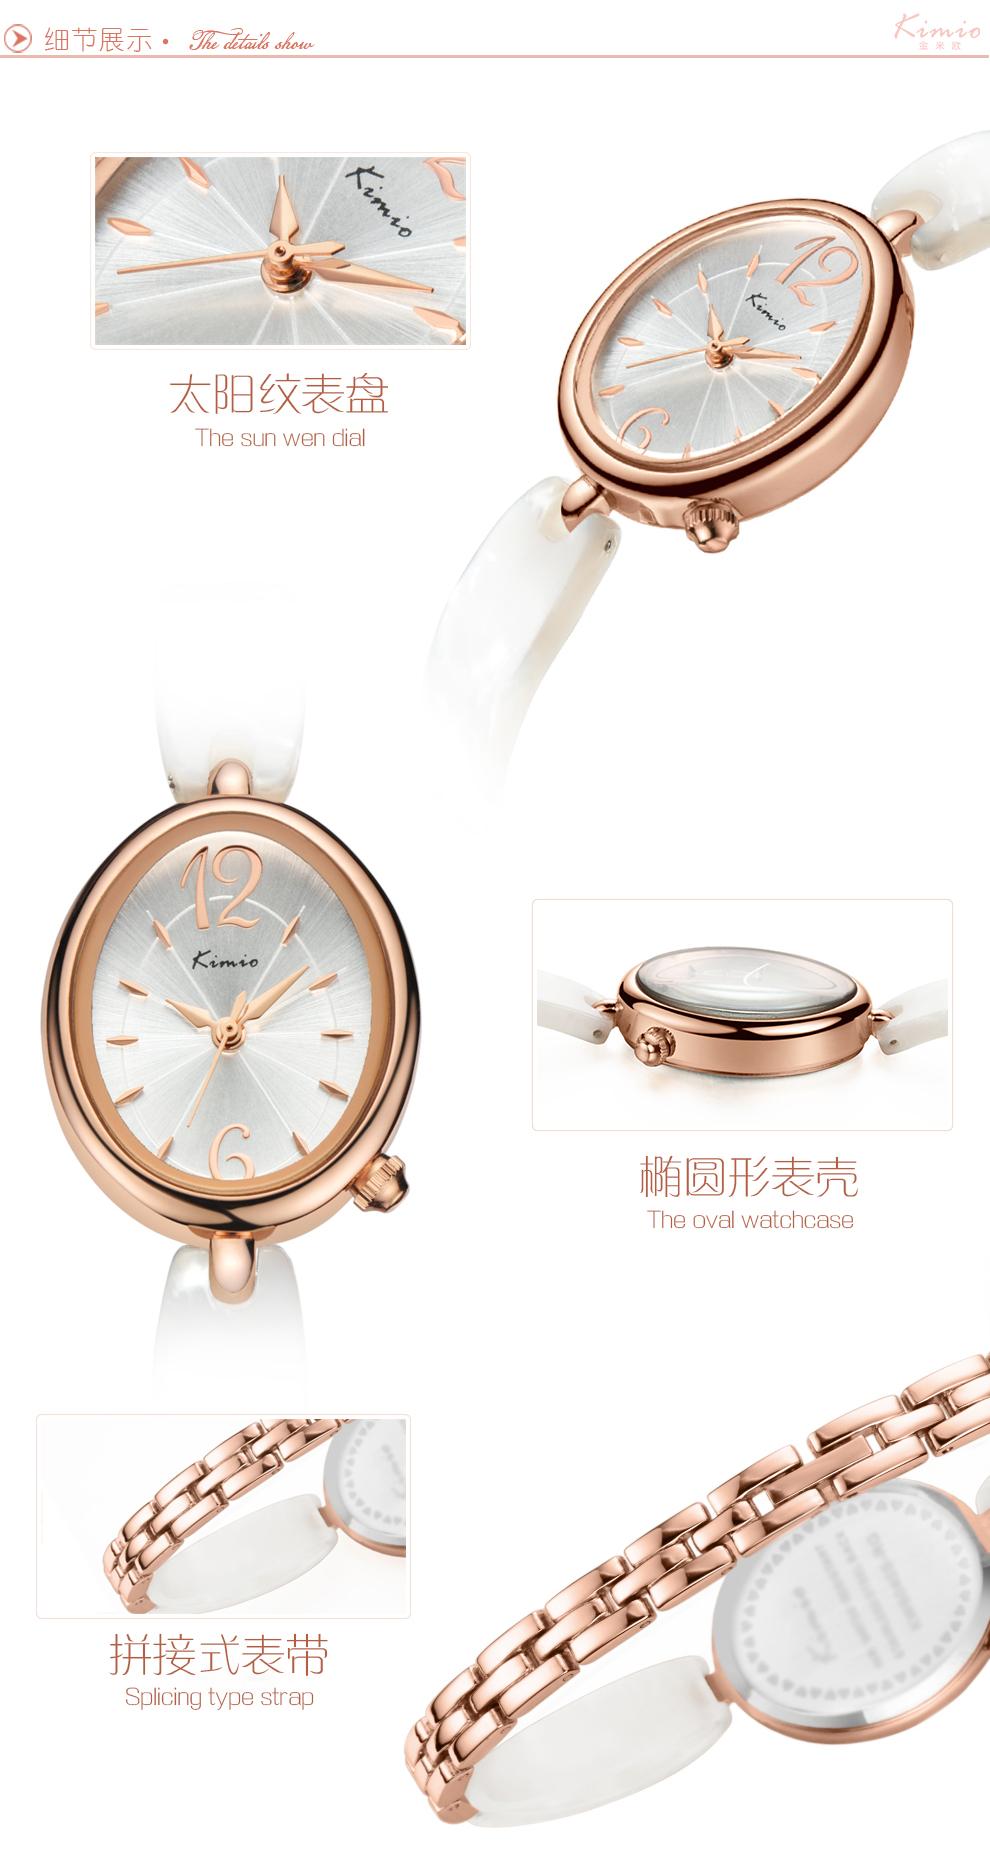 Watch Women famous brand luxury Fashion Casual quartz Unique Stylish Hollow  skeleton watches leather sport Lady wristwatchesUSD 5.07 piece 2af7a02f38d3